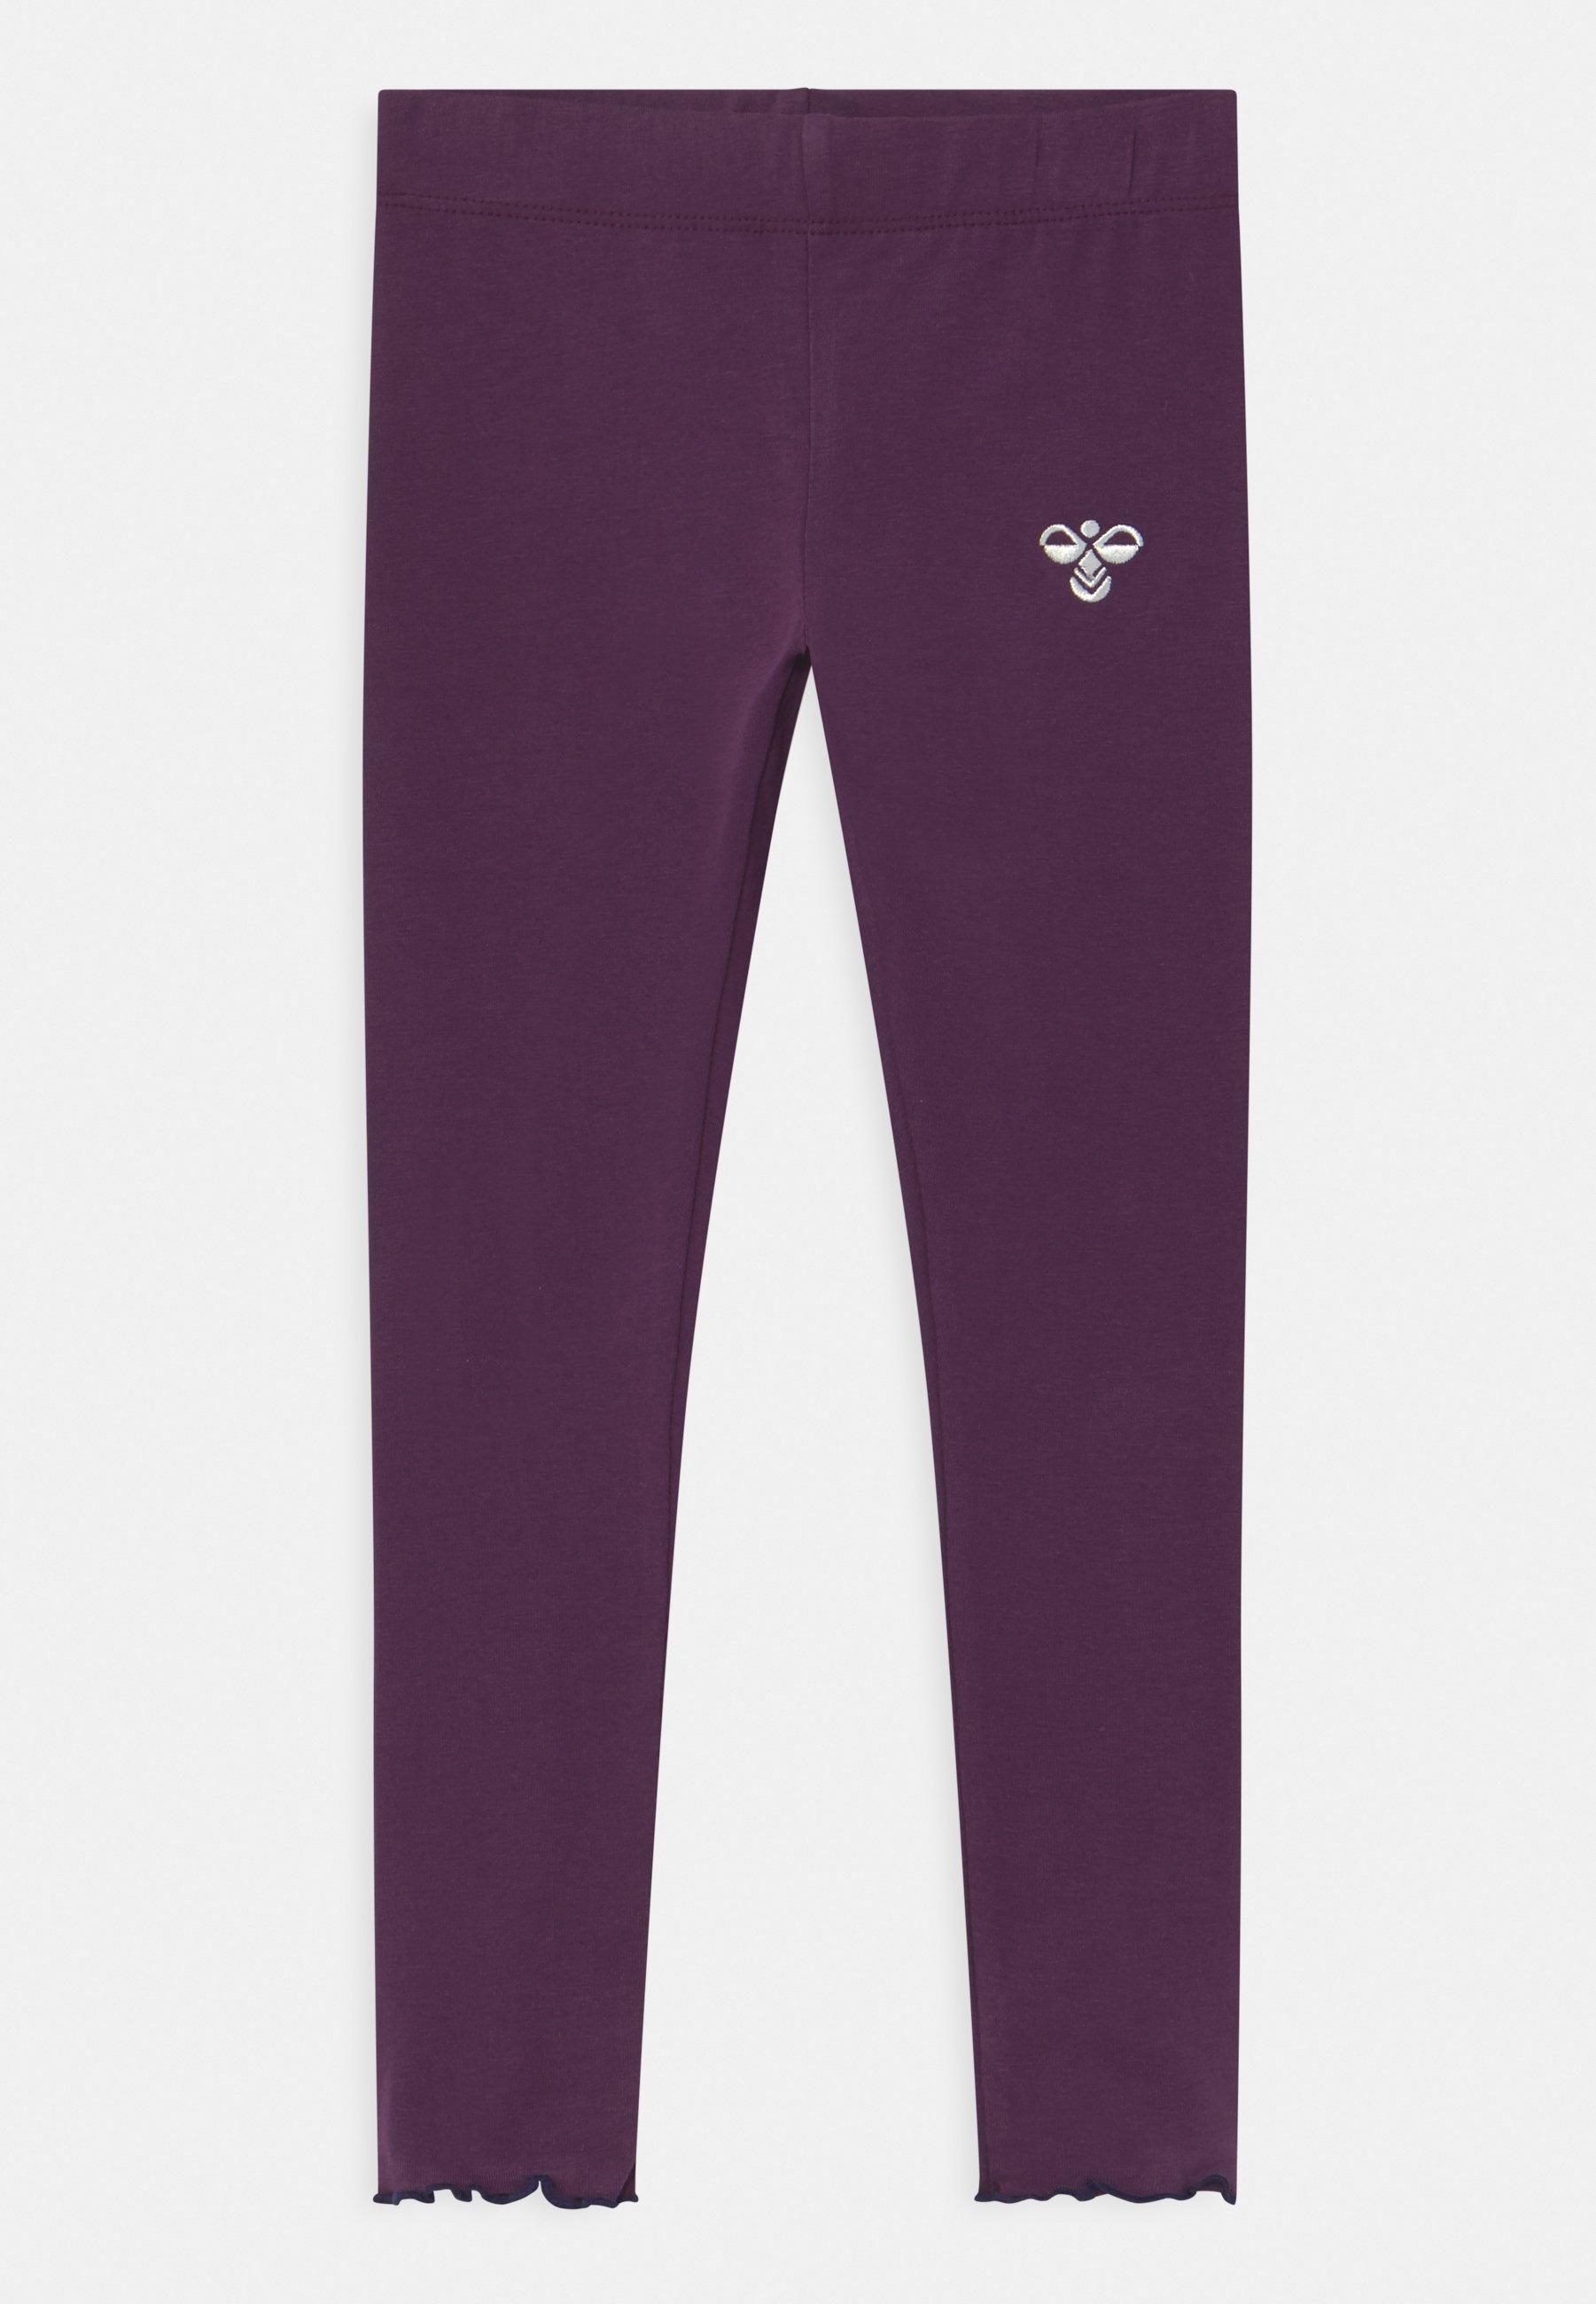 Kjøp JAZZ klær online Forhandler i Norge | Suserisivet.no